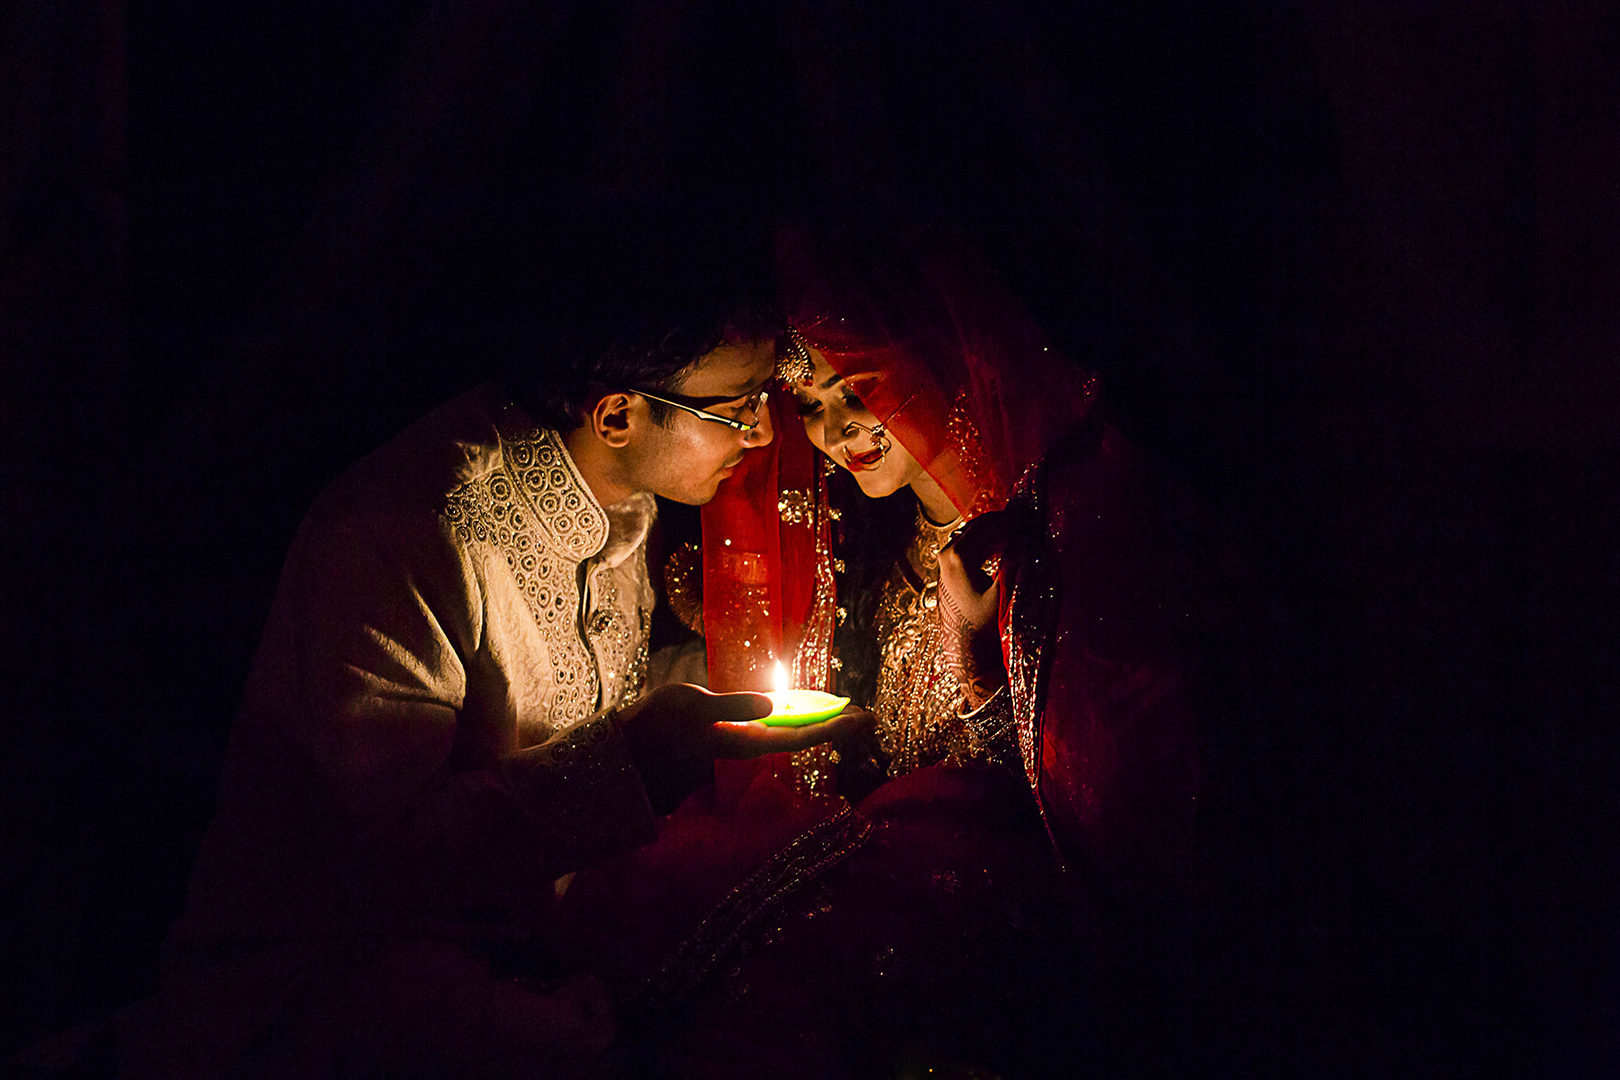 Photographer: Gobinda Paul   Country:   Bangladesh  Title: The candlelight reveals love